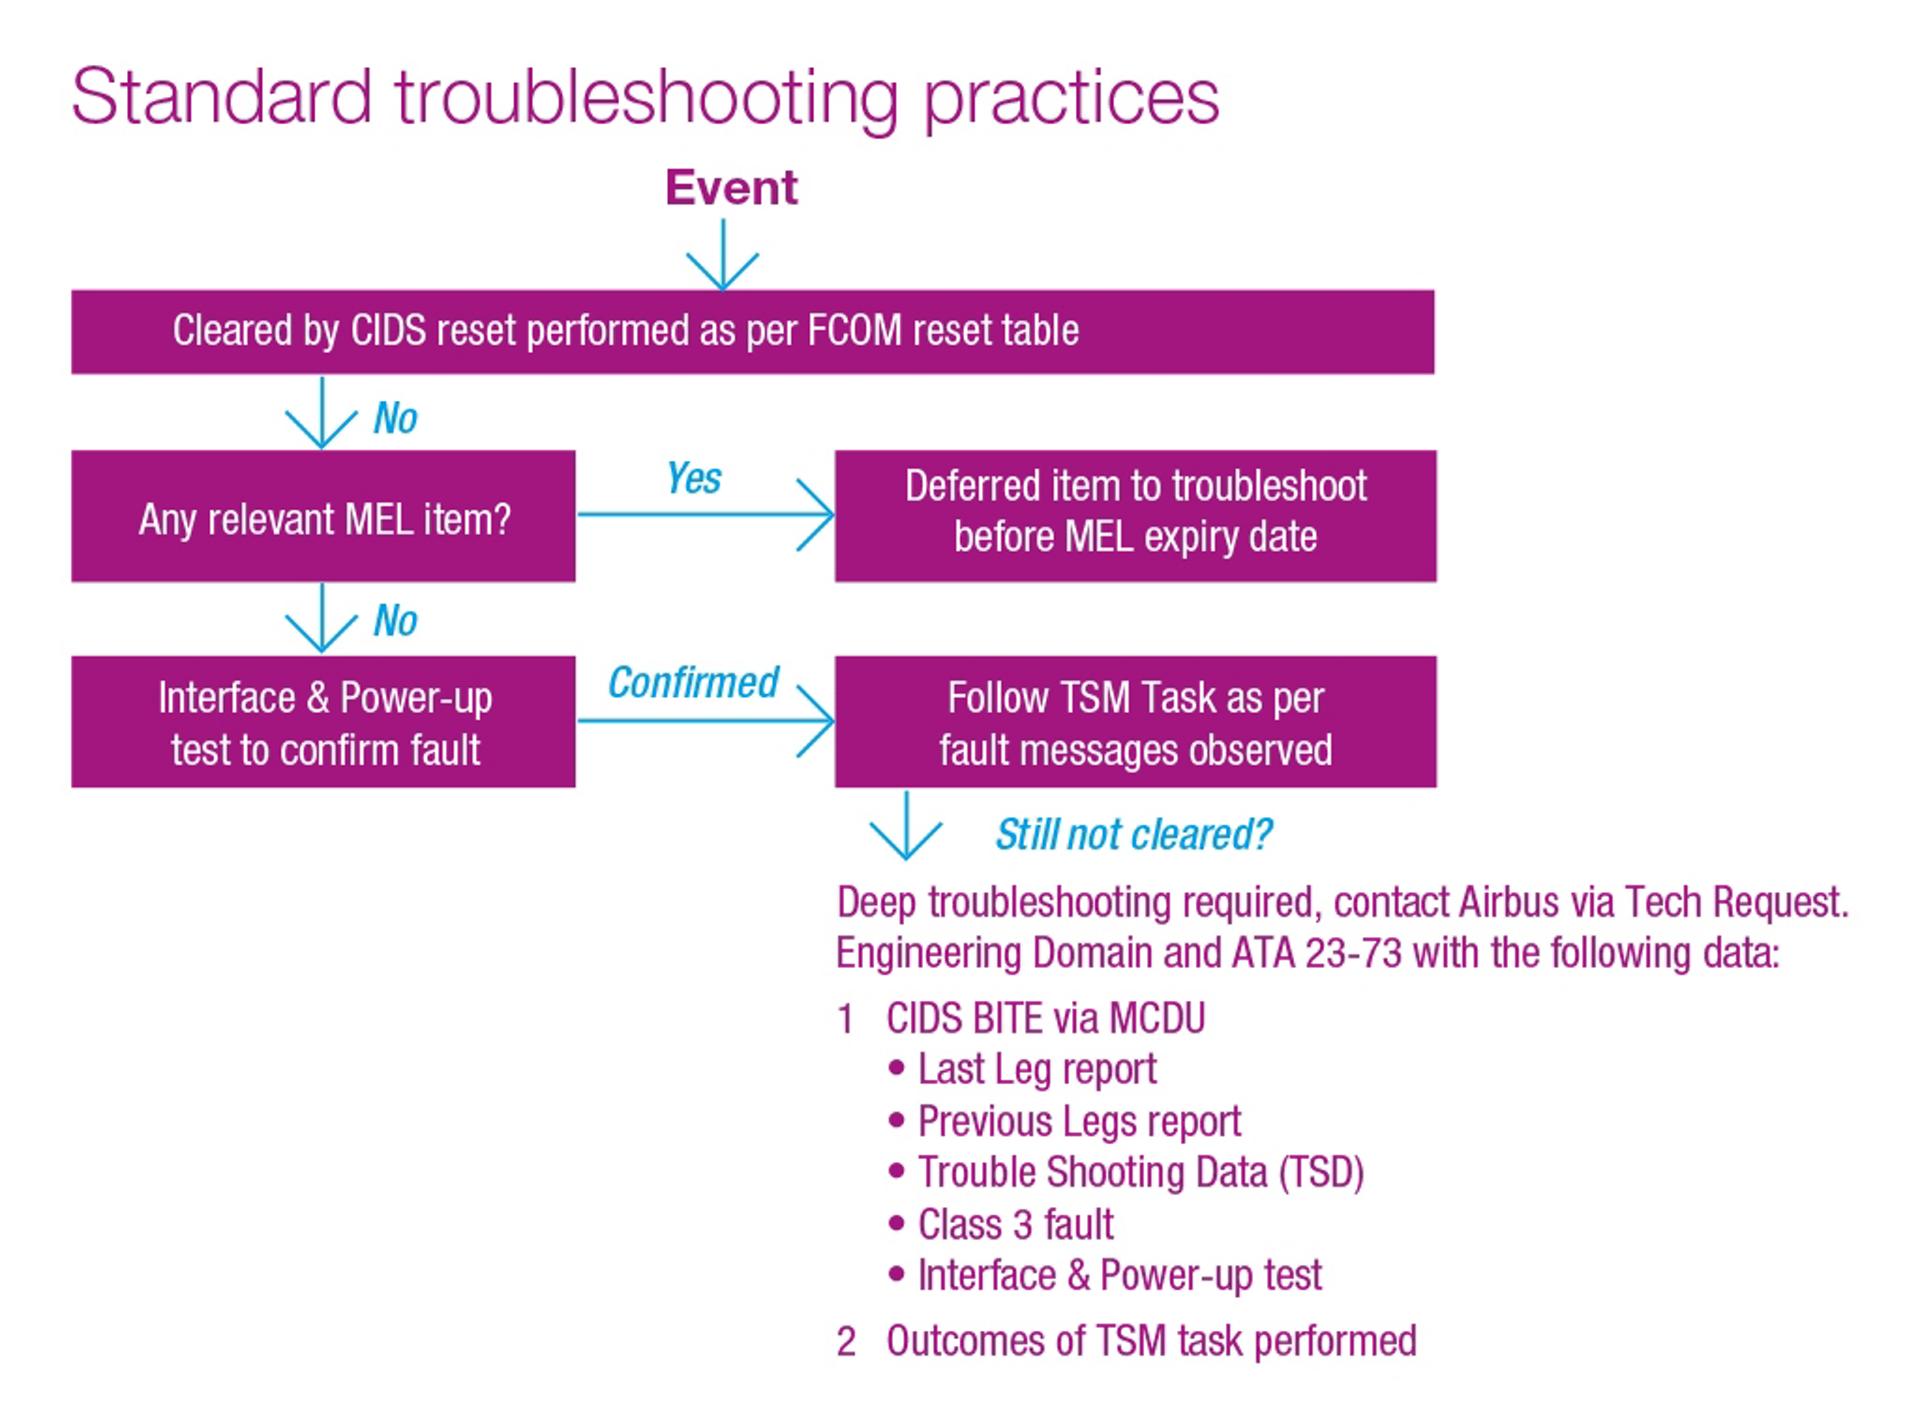 Standard Troubleshooting Practices